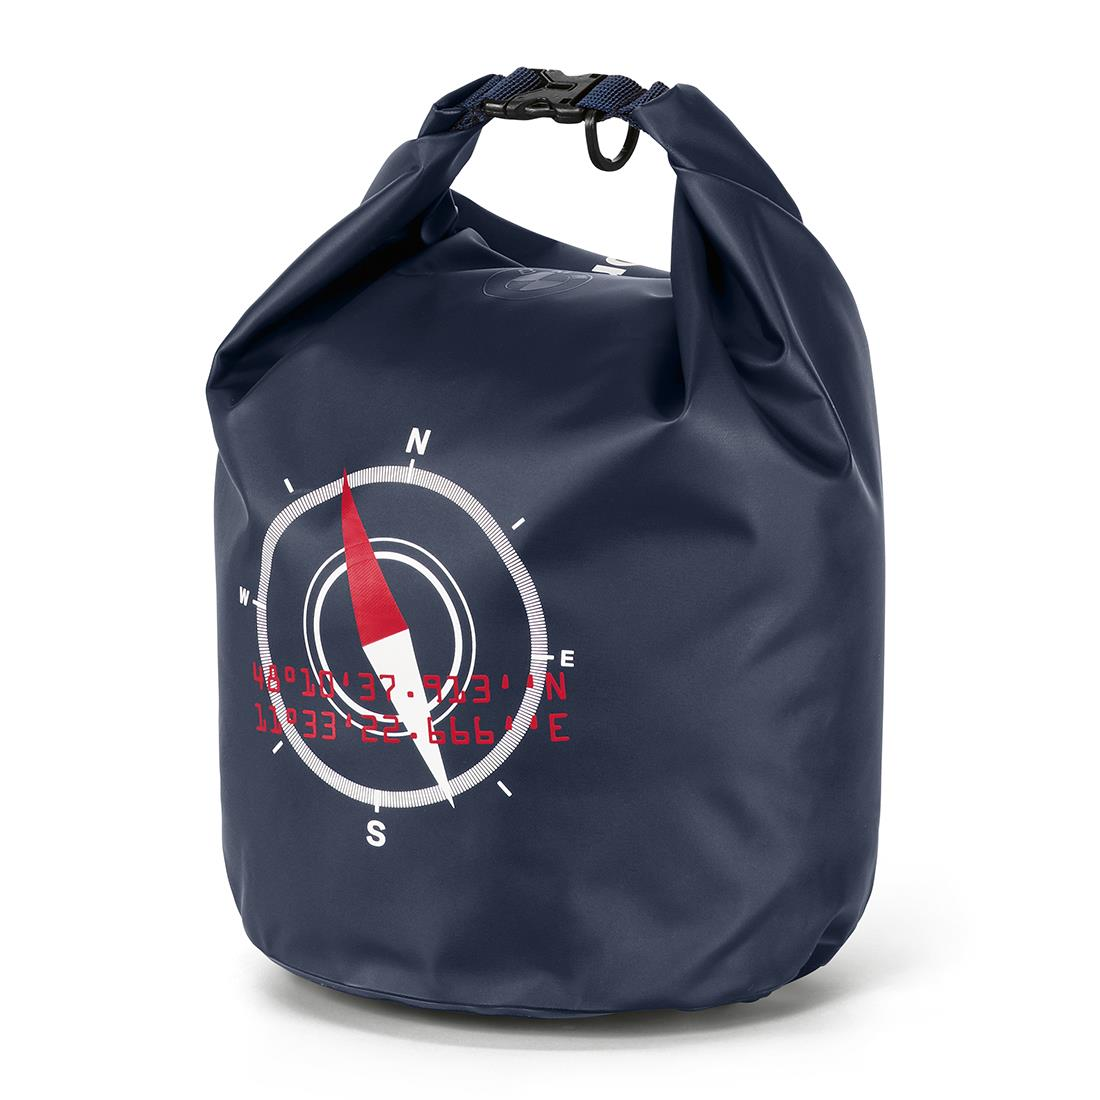 BMW Yachtsport Small Dry Bag